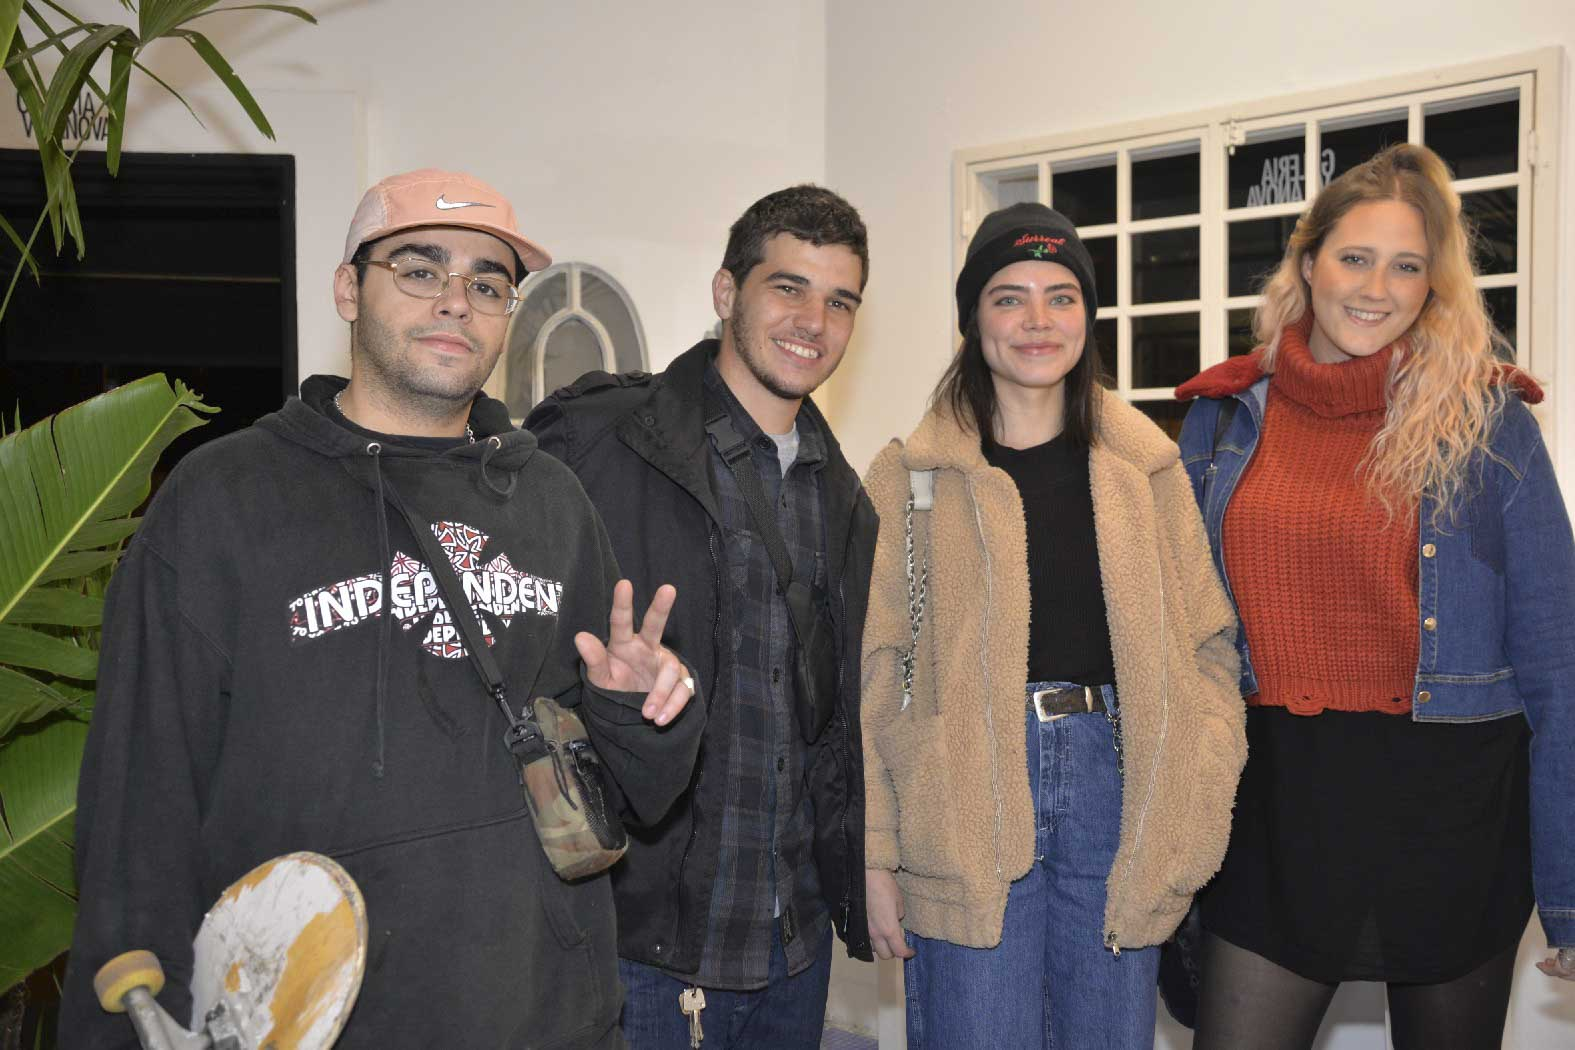 Diego Andrade, Victor Cardoso, Julia Andrade e Danielle Longobardi (2)